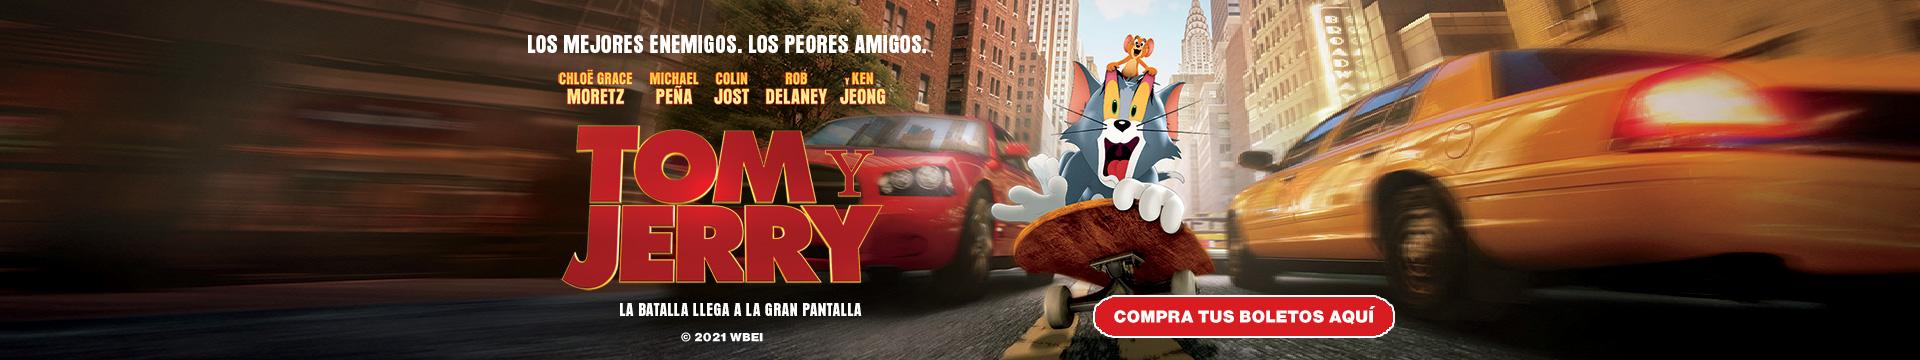 En Cartelera: Tom y Jerry